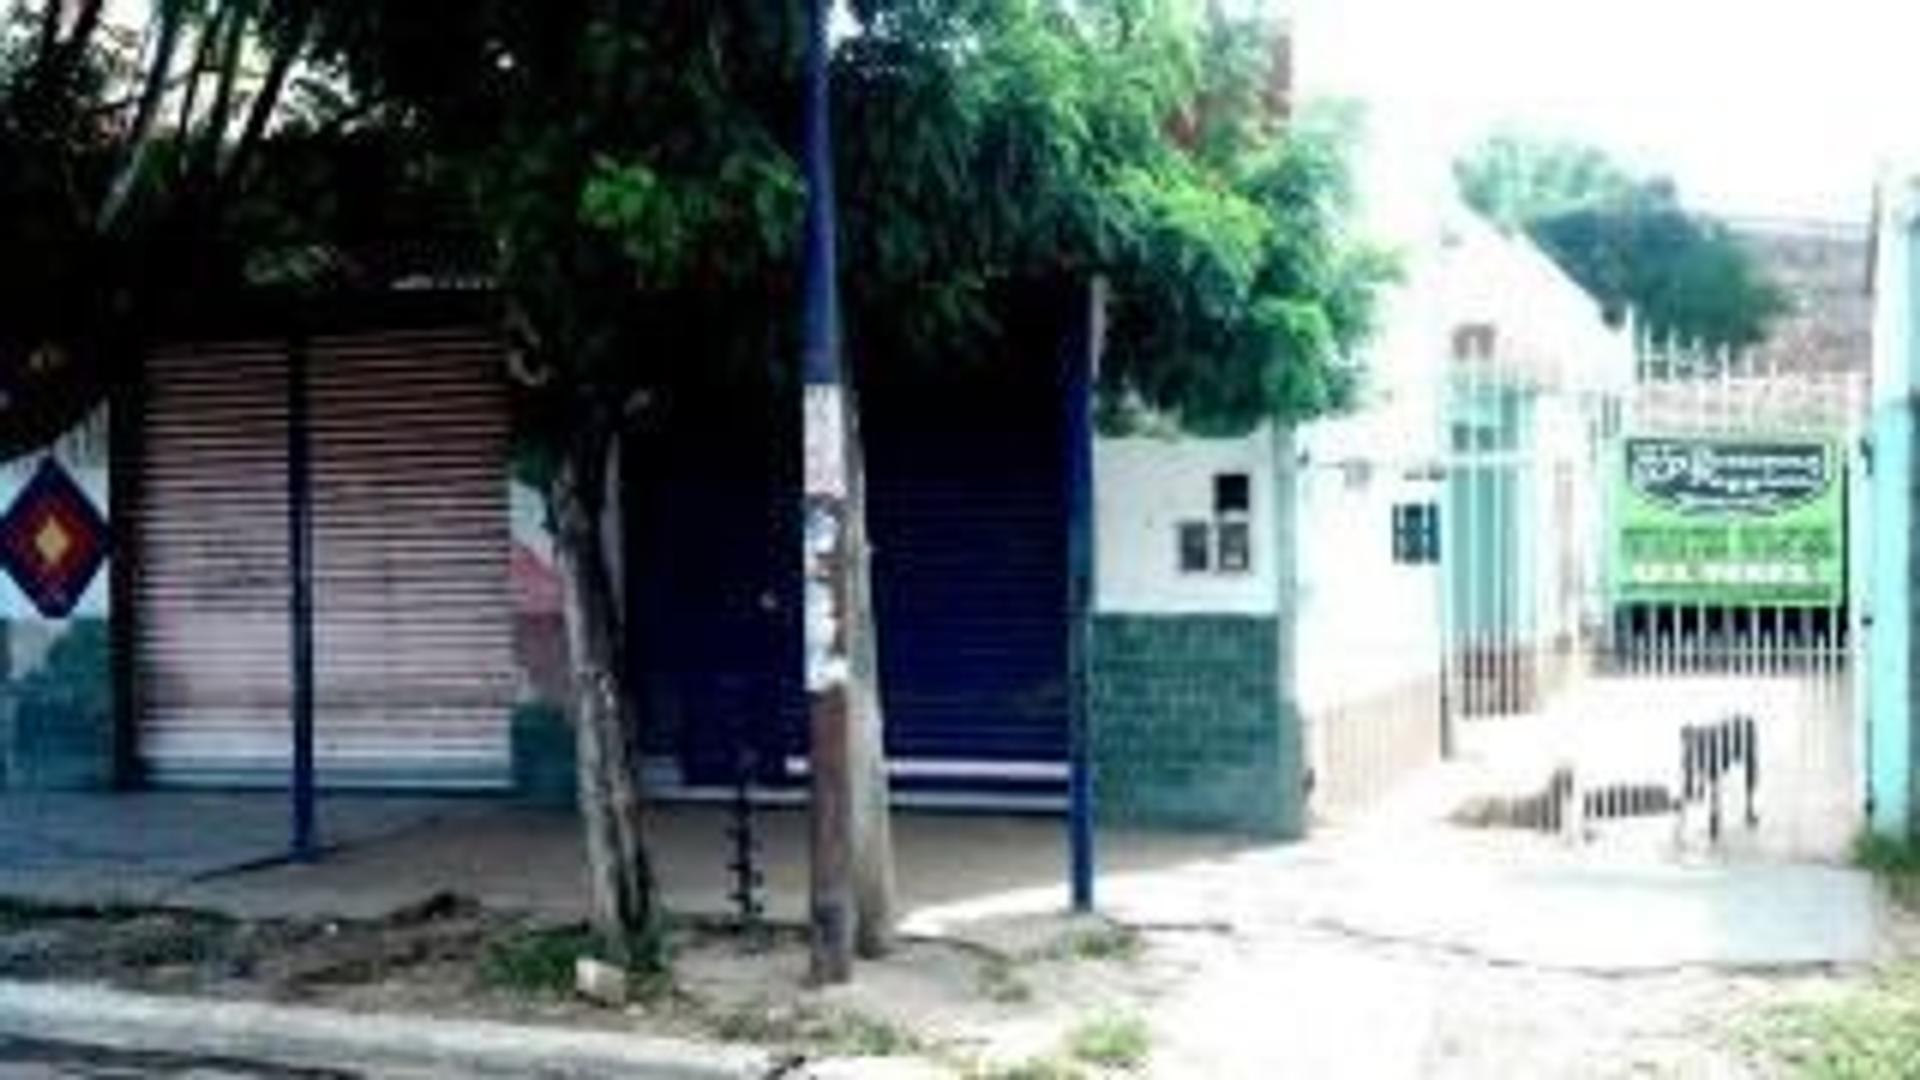 VENTA- 2 locales + Casa sobre calle PEYRET (Intentende Leopoldo suarez) US$ 69.000